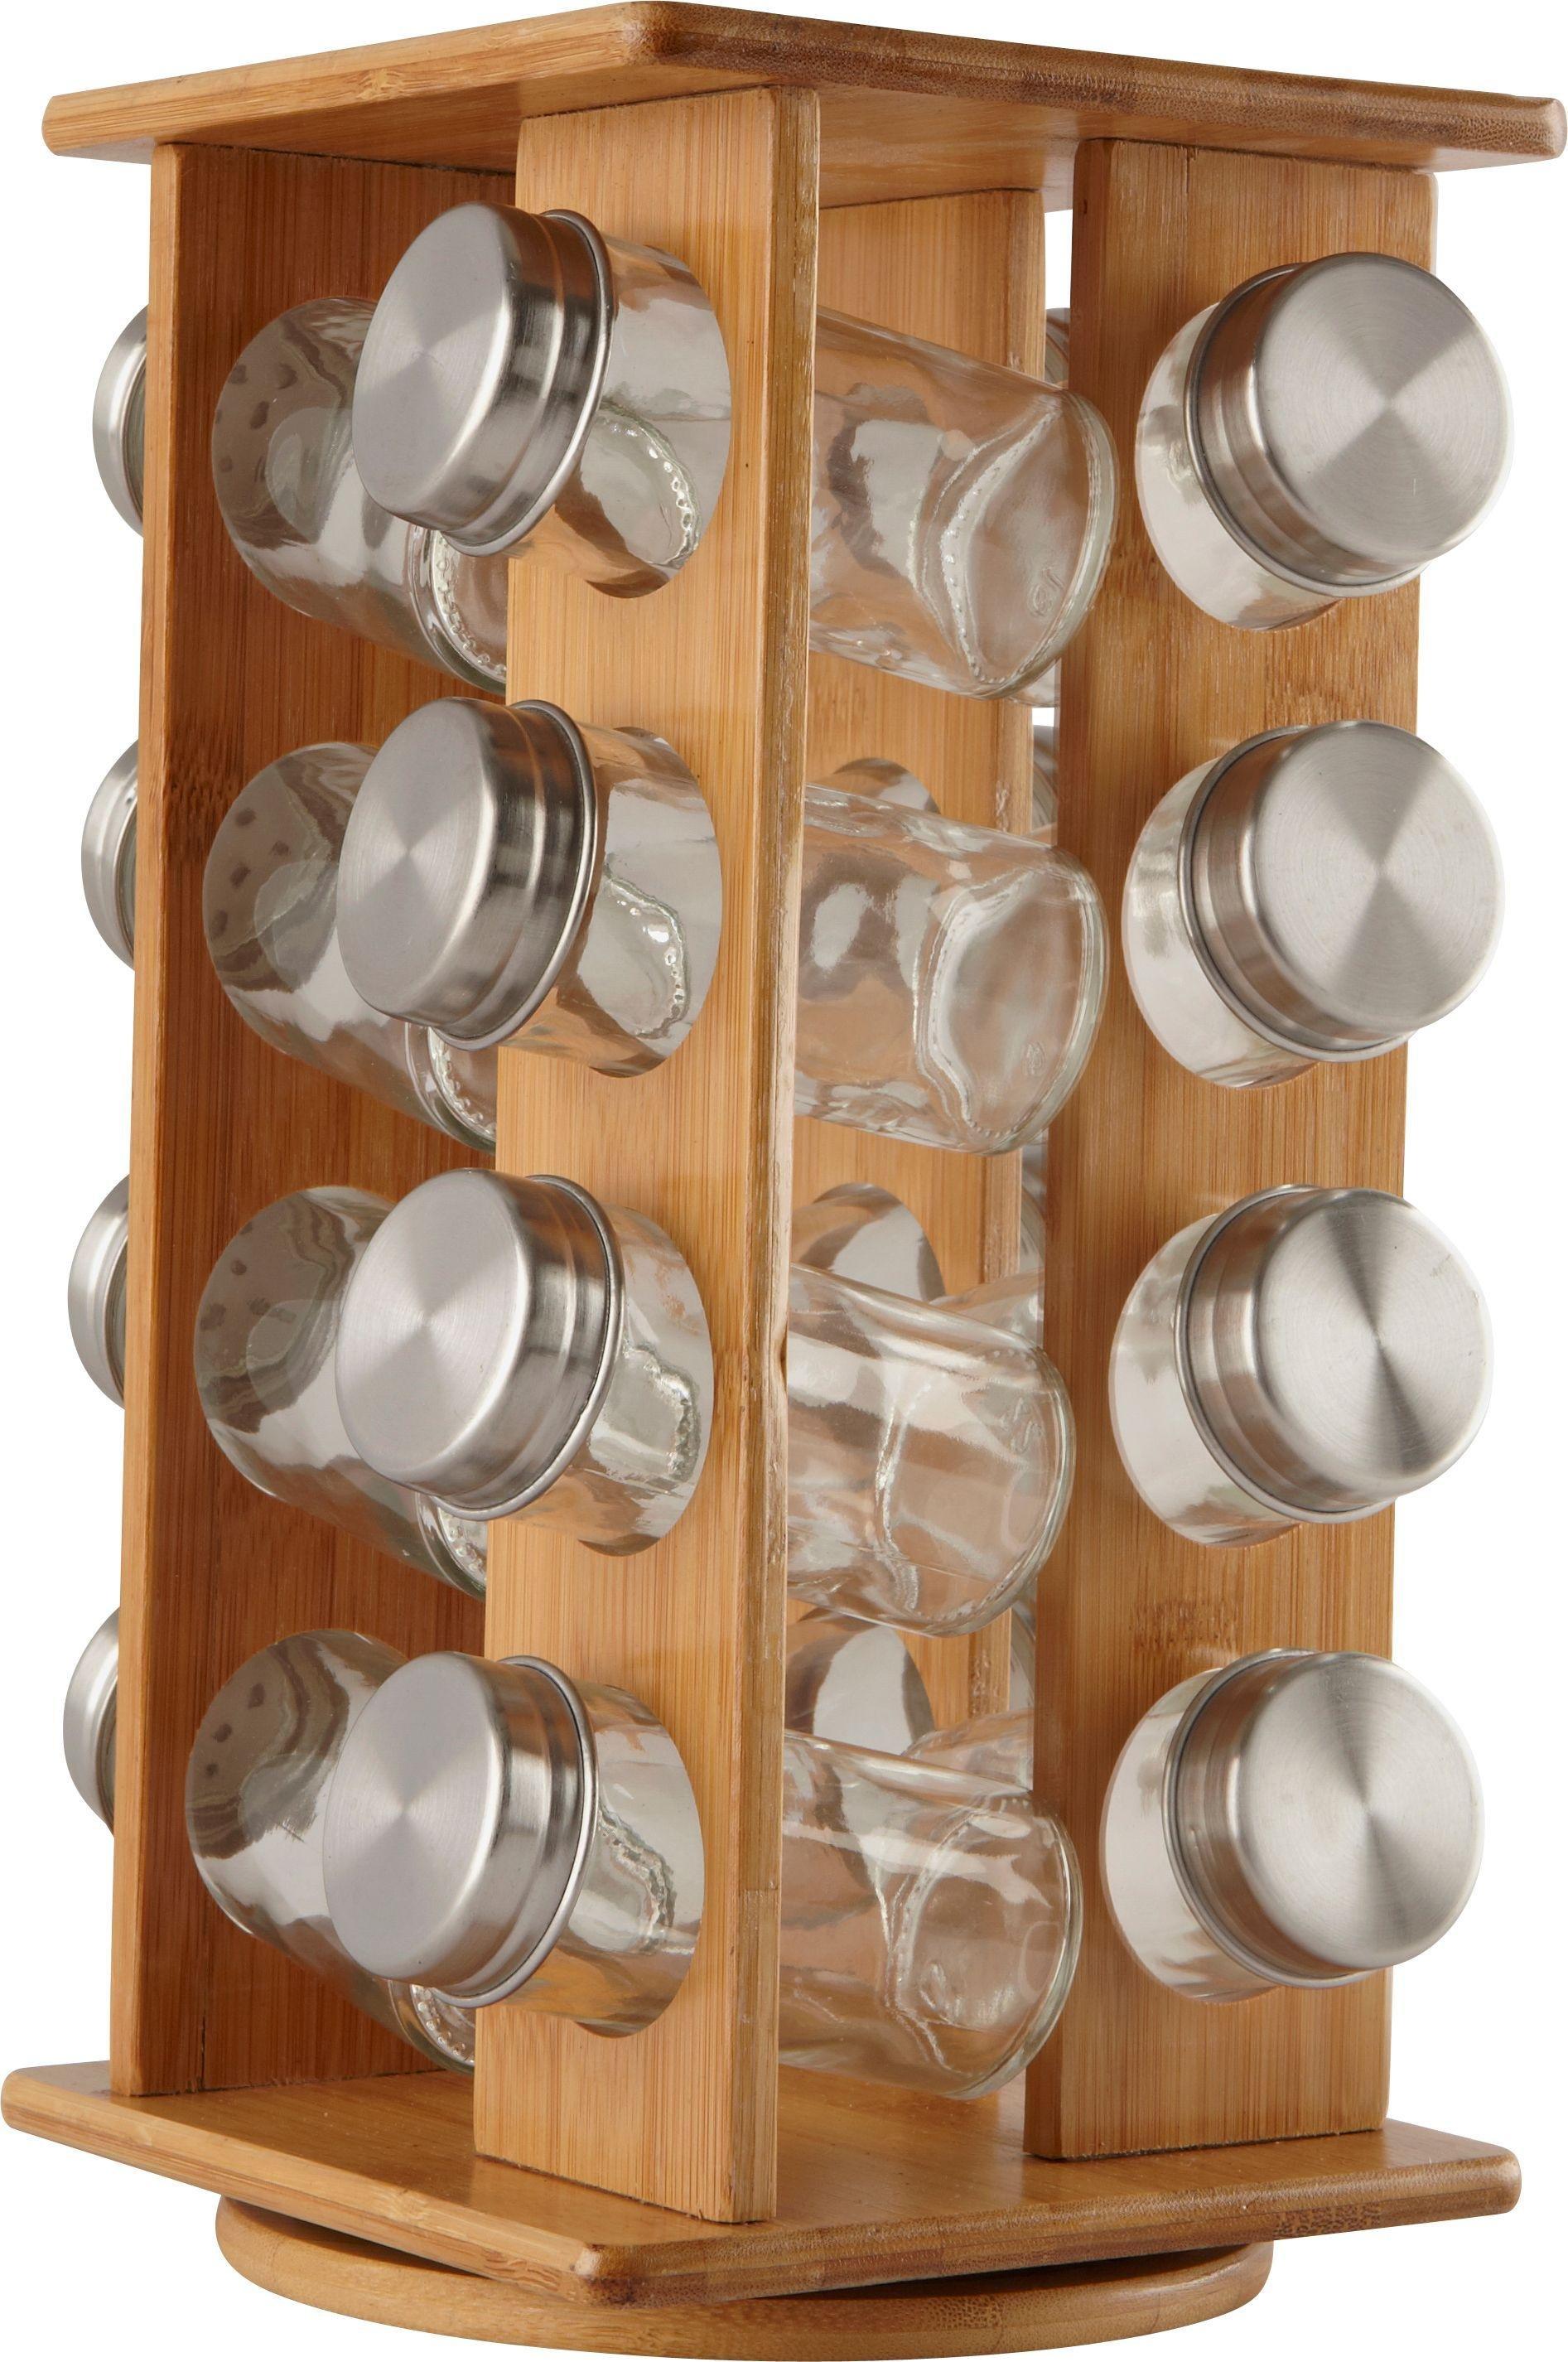 HOME - Wooden Revolving Spice Rack